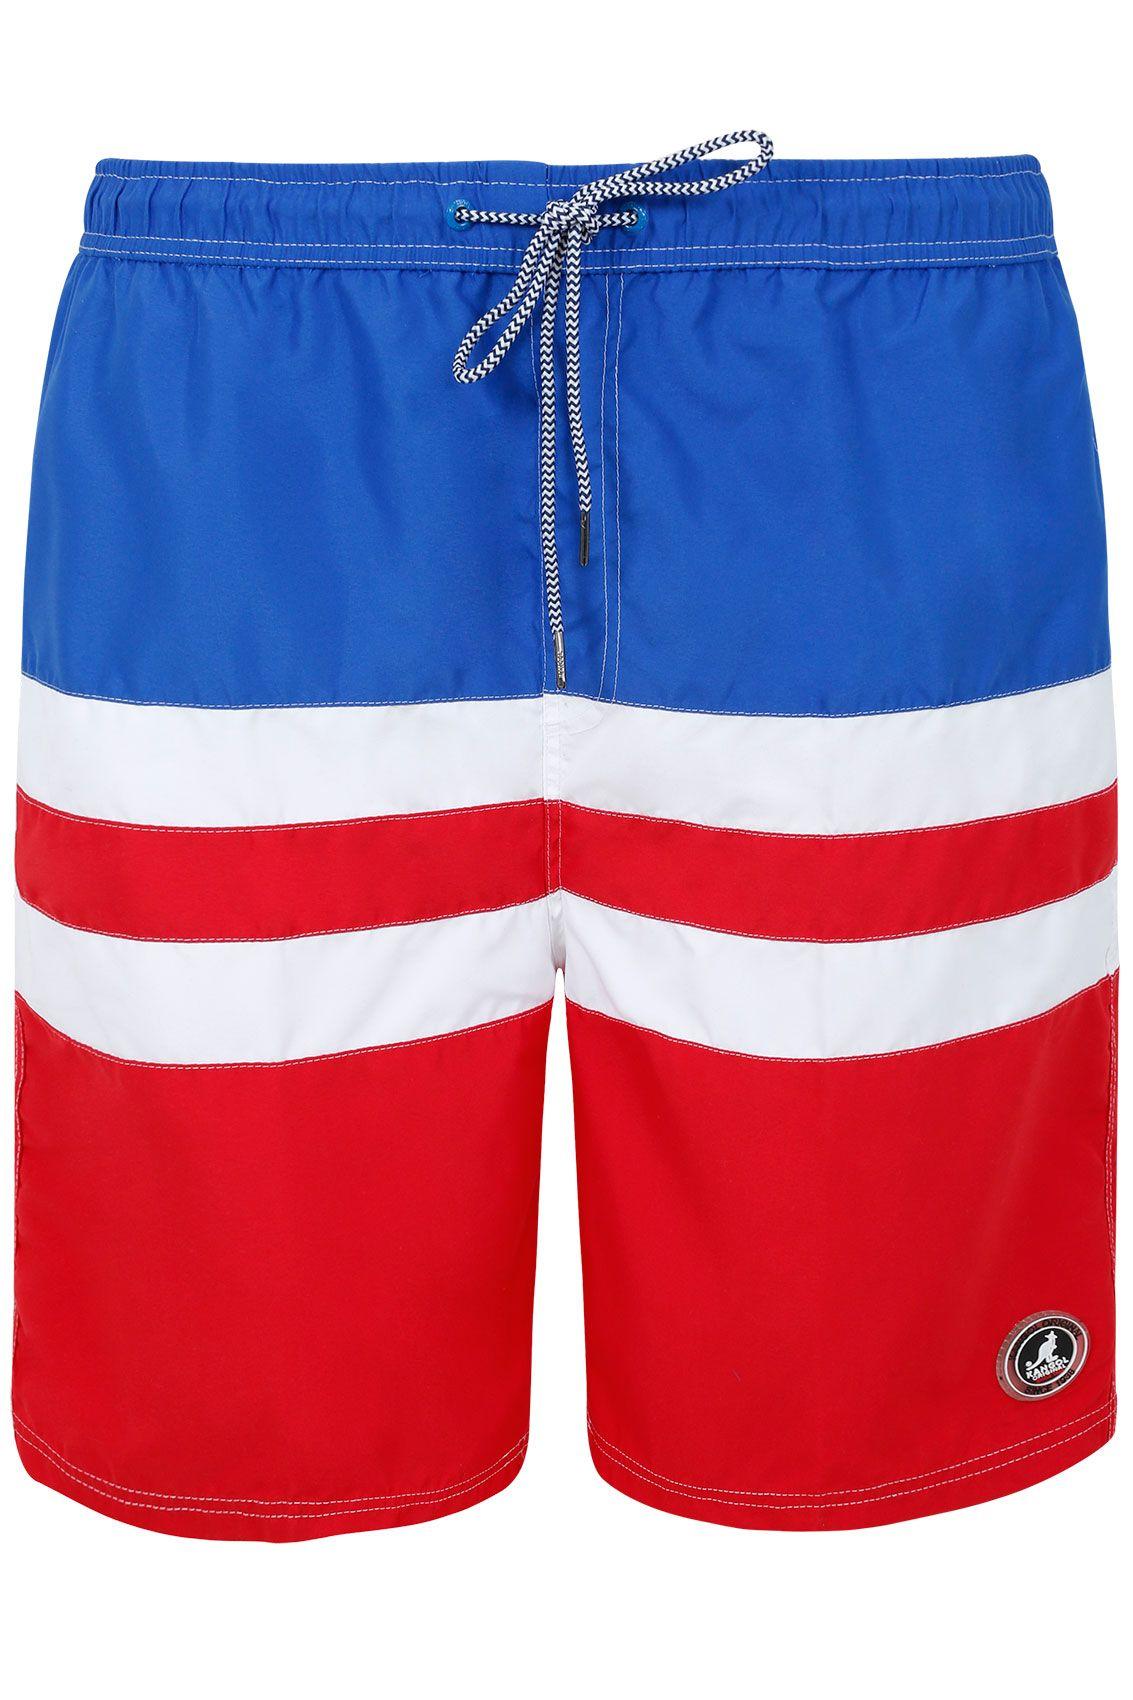 852934718c BadRhino Black Swim Shorts | Pierre XL - SS17 | Swim shorts, Blues ...